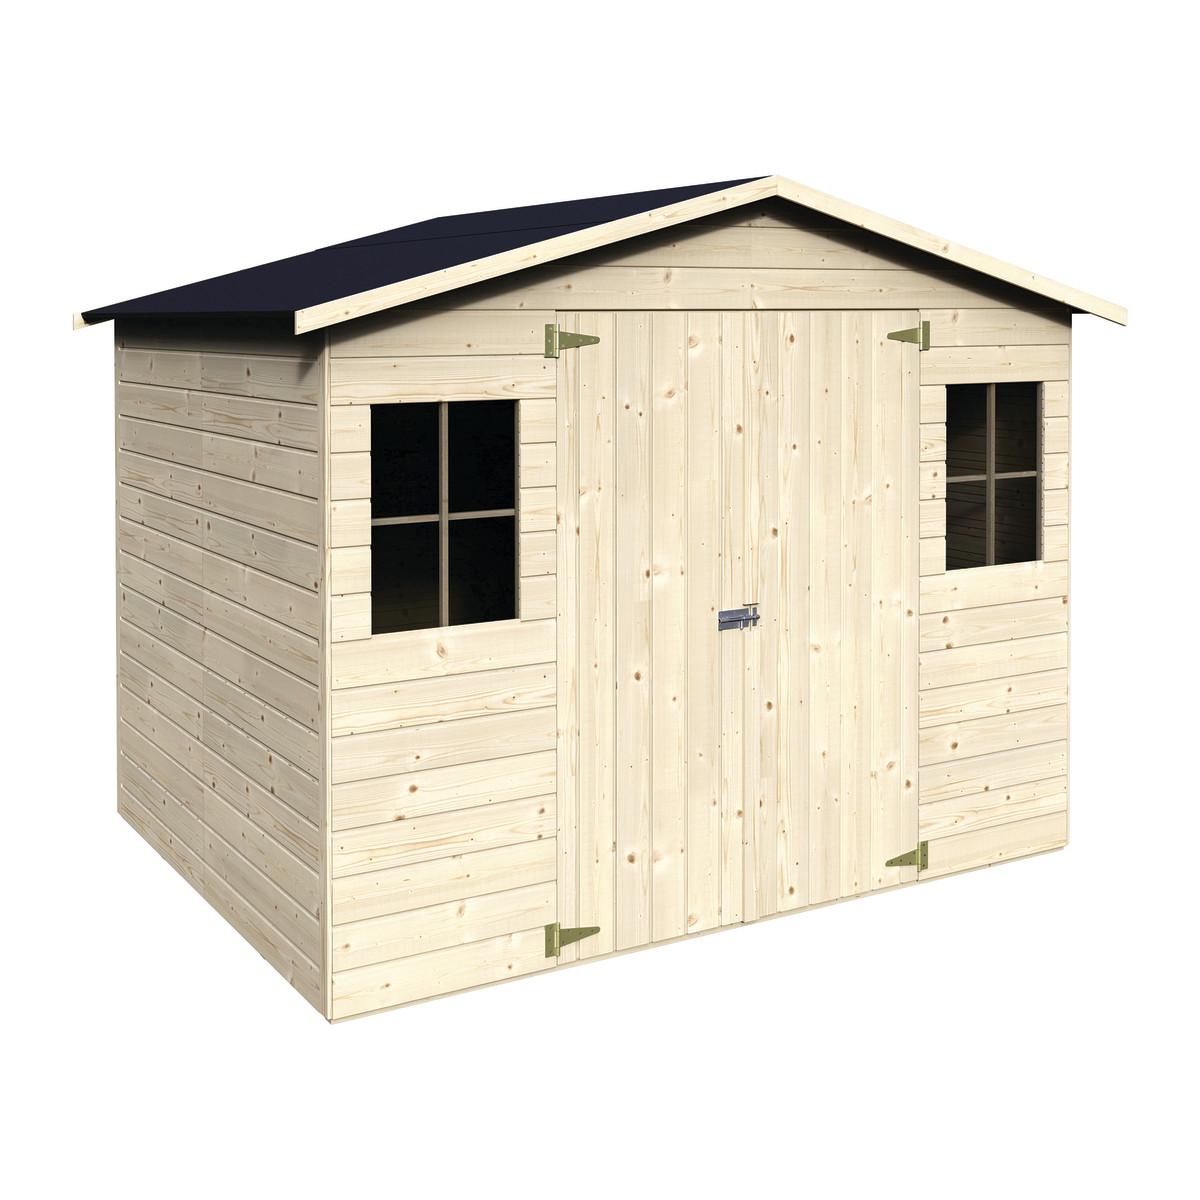 Casetta in legno bouganvillea 265 x 194 cm spessore 12 mm for Leroy merlin gazebo giardino in legno